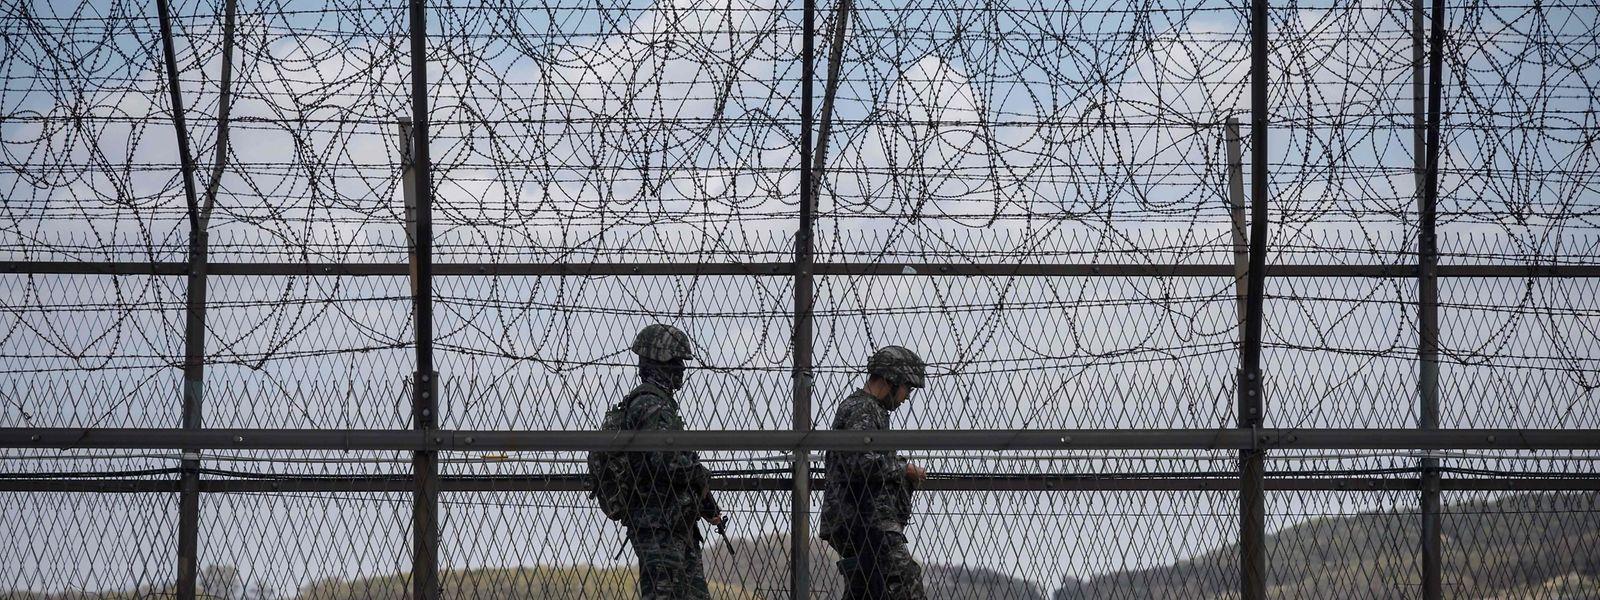 Südkoreanische Soldaten patrouillieren entlang des Grenzzauns zu Nordkorea.